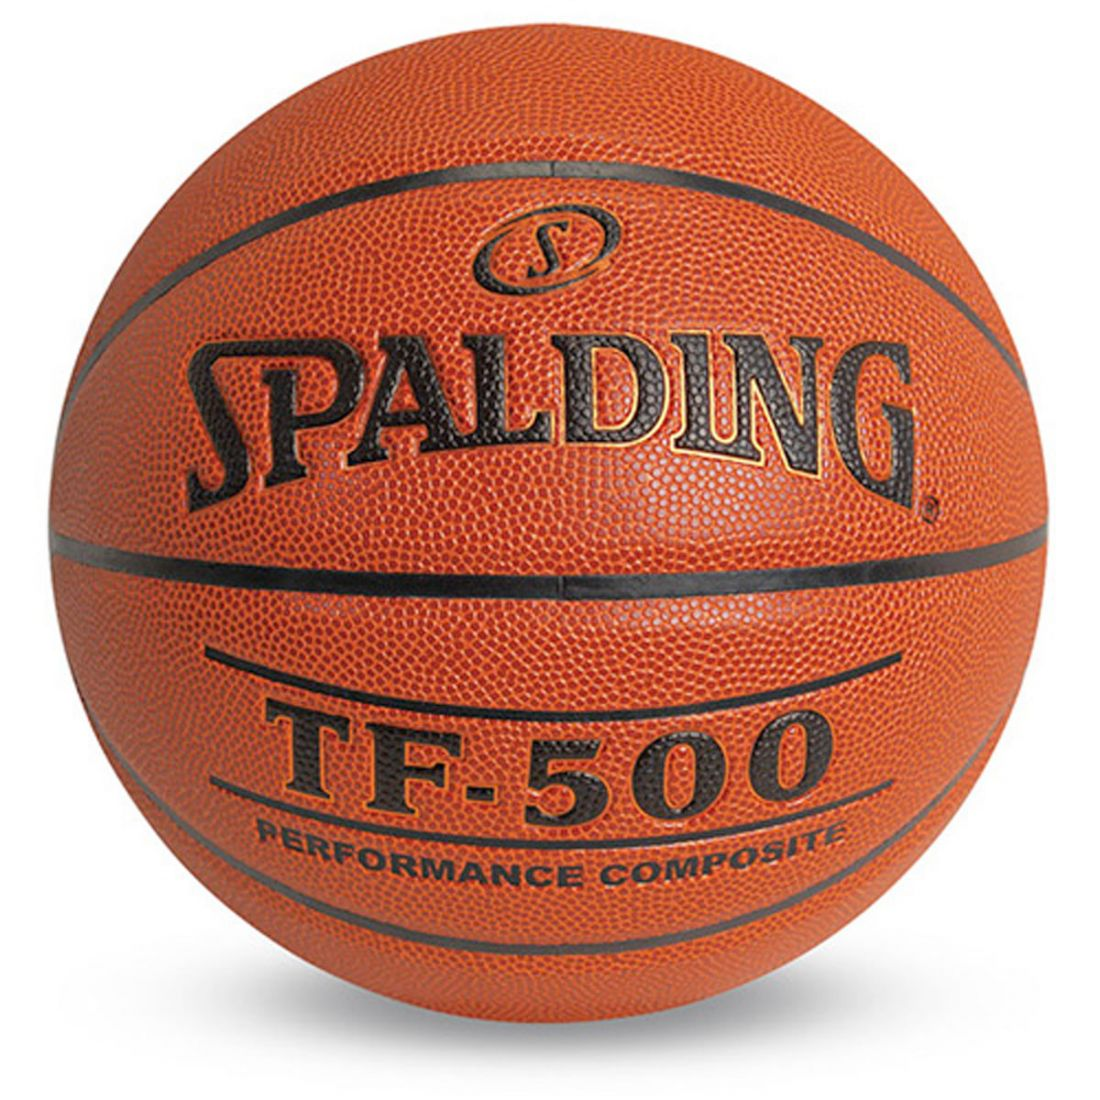 Мяч баскетбольный Spalding TF-500 (74-529)